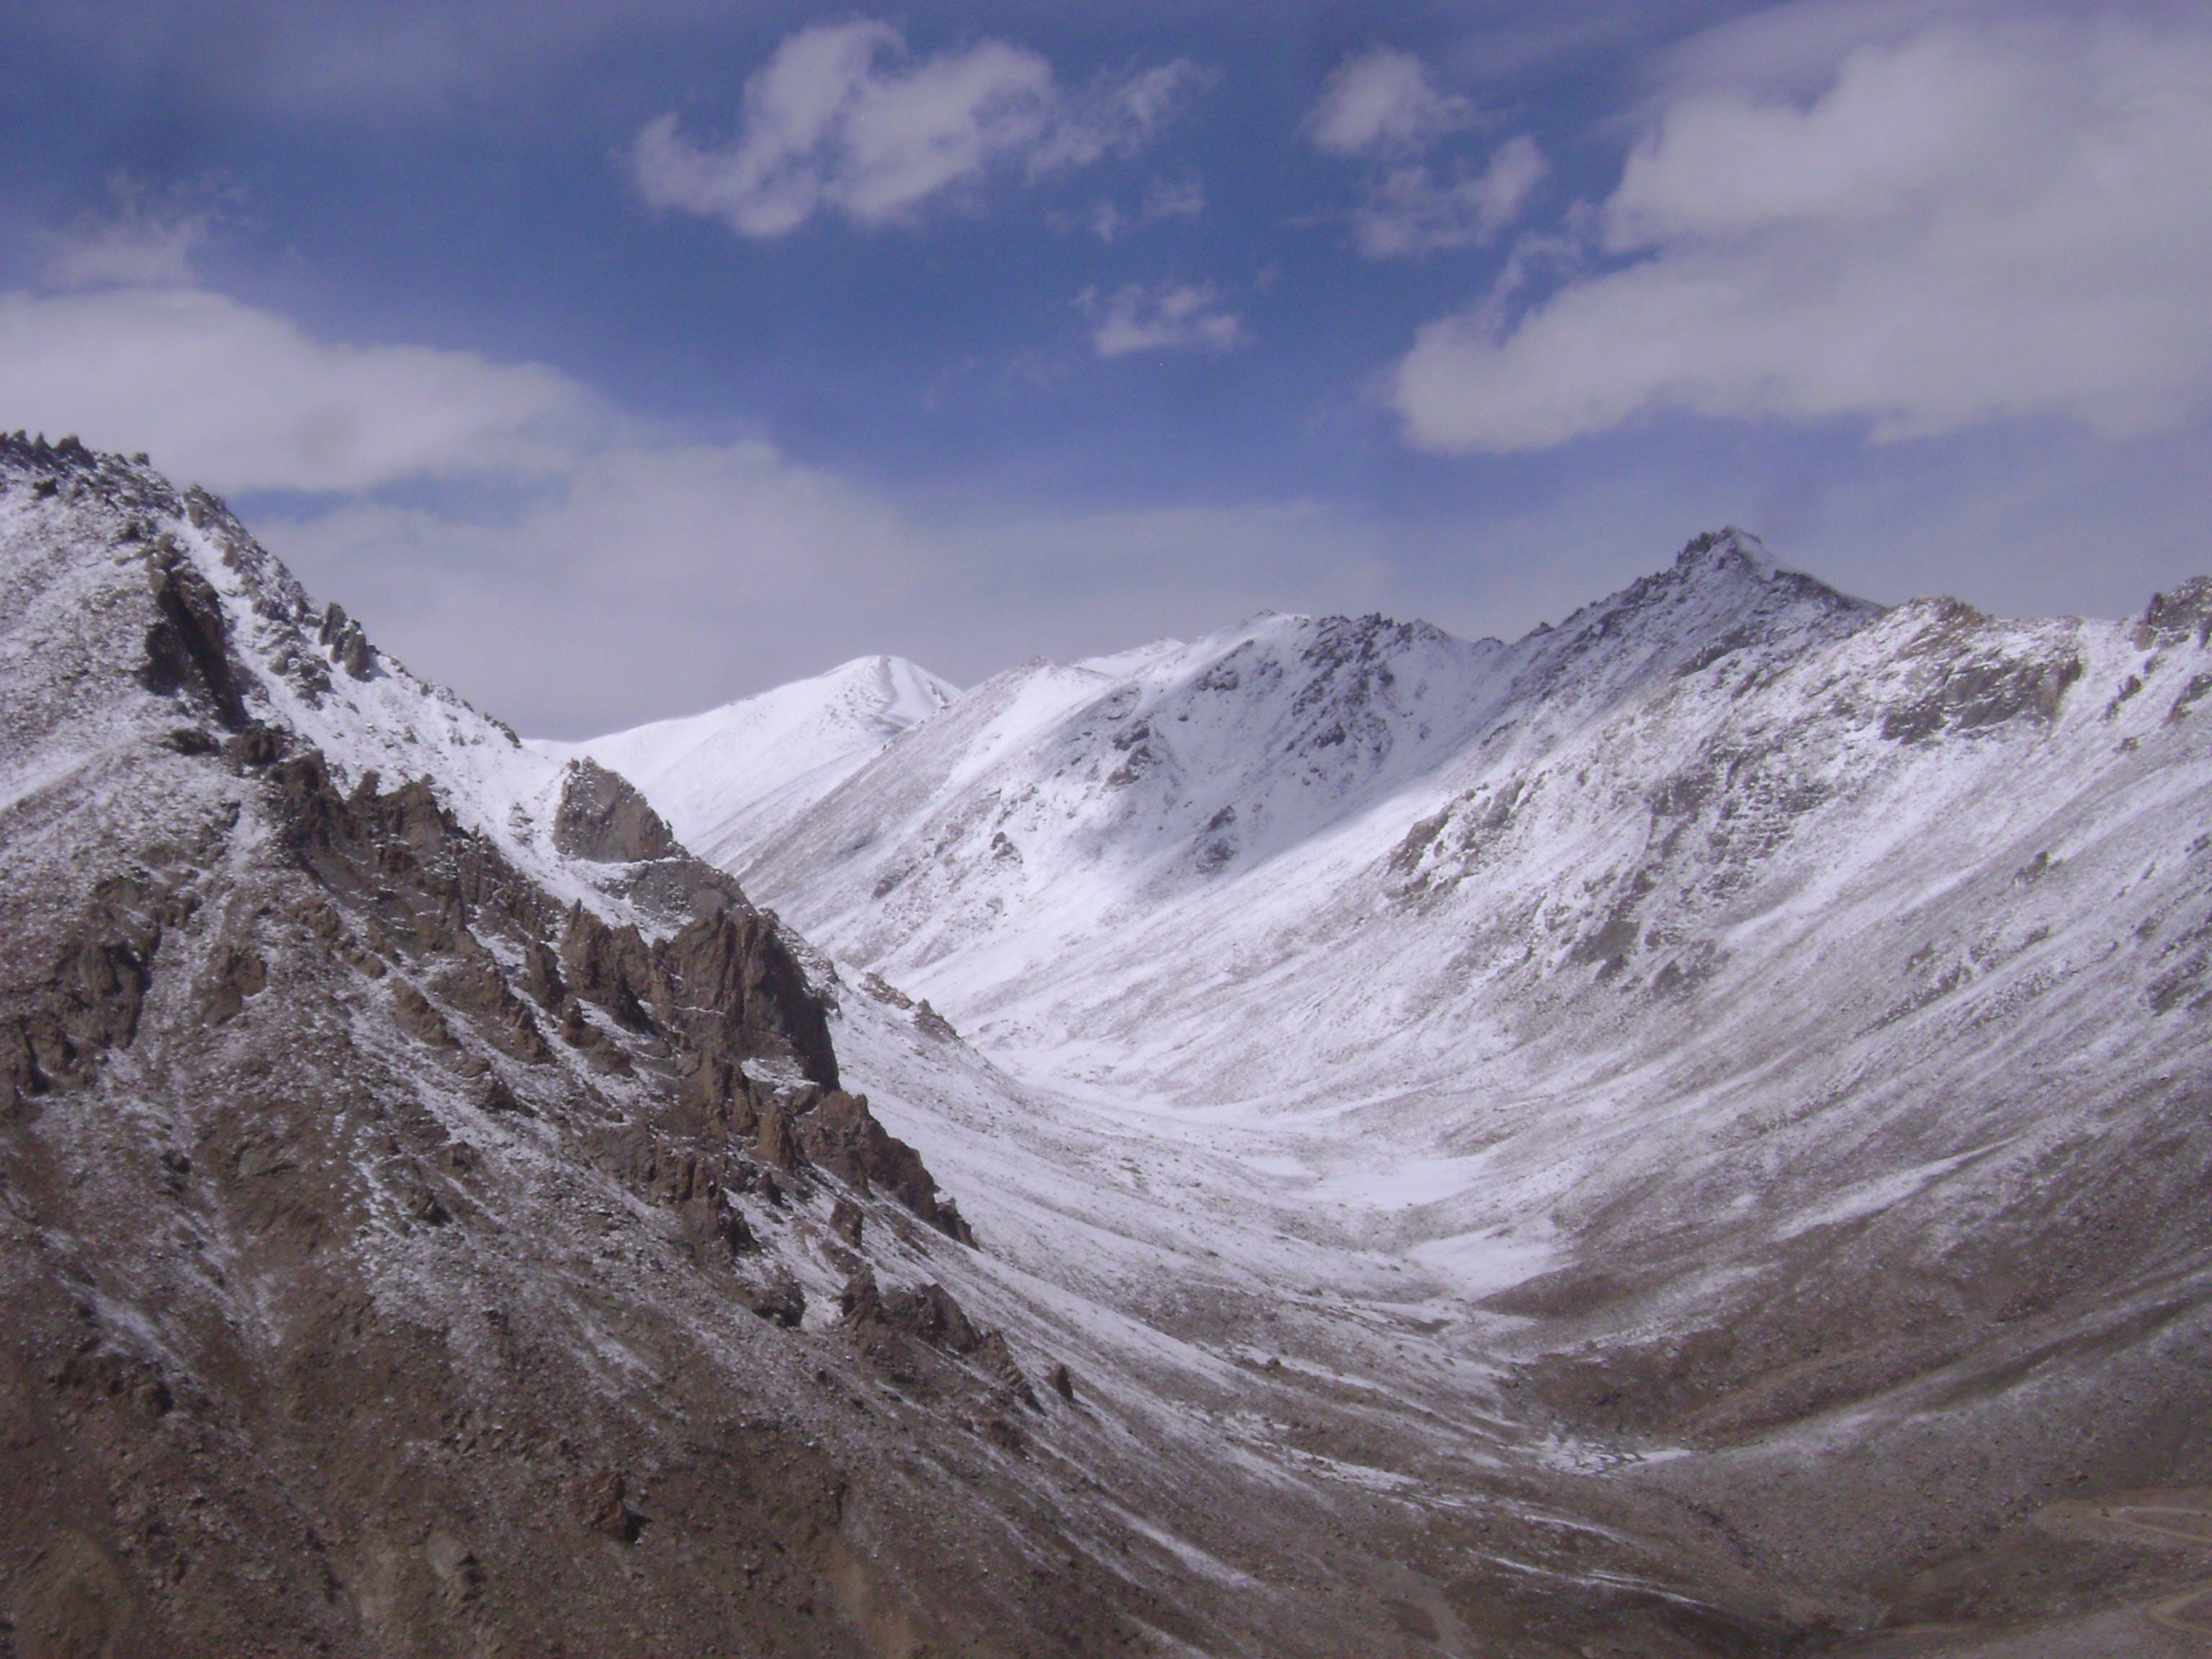 Kostenloses Stock Foto zu abenteuer, berg, felsen, felsiger berg